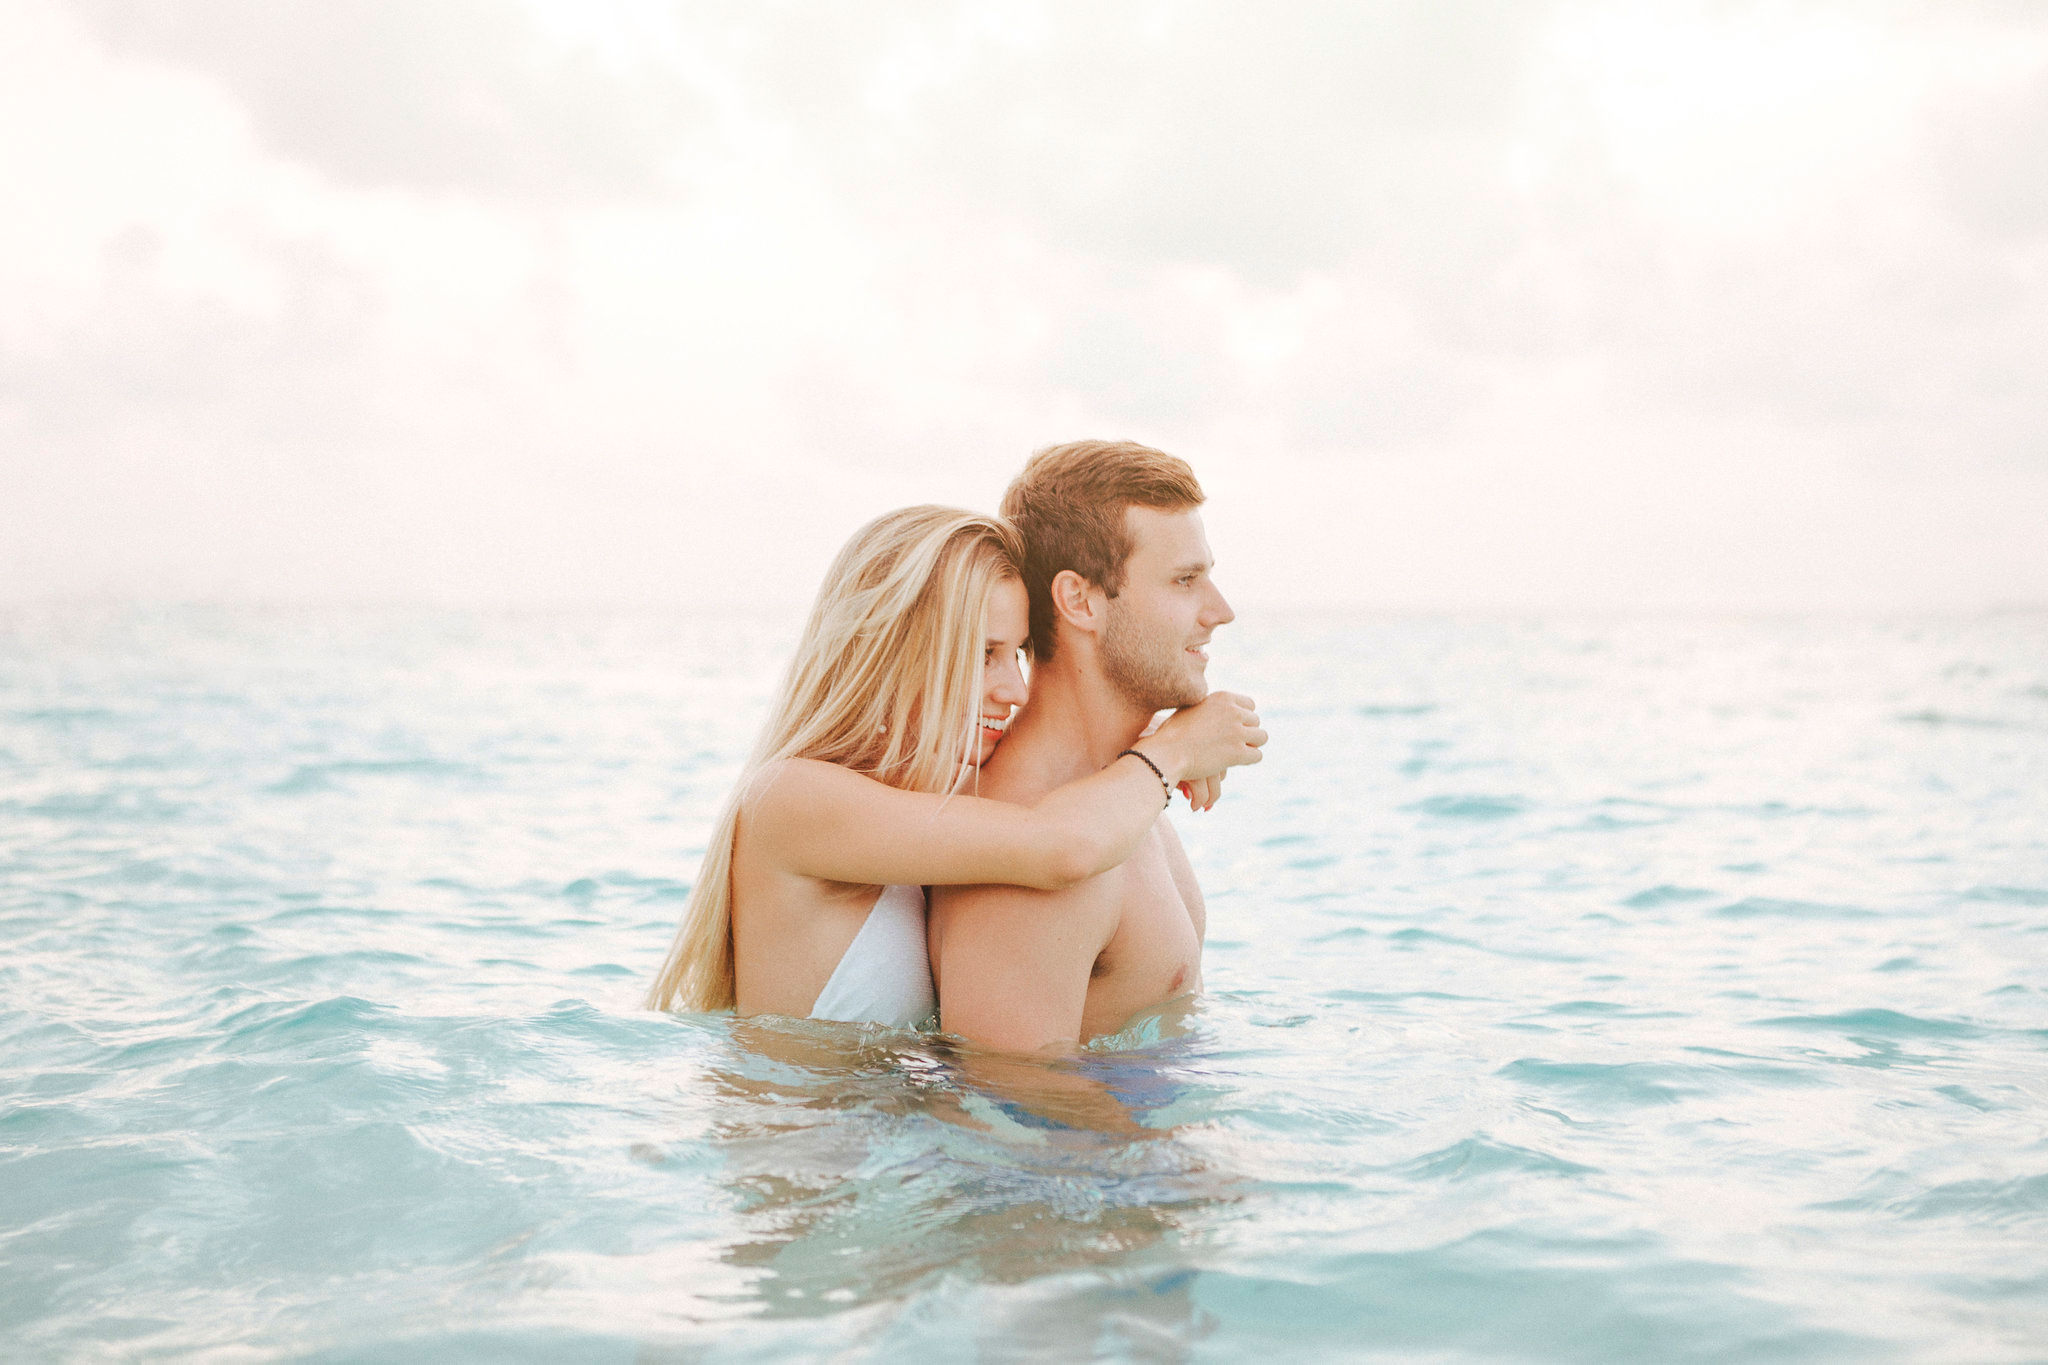 043-maldives-destination-wedding-photographer.jpg